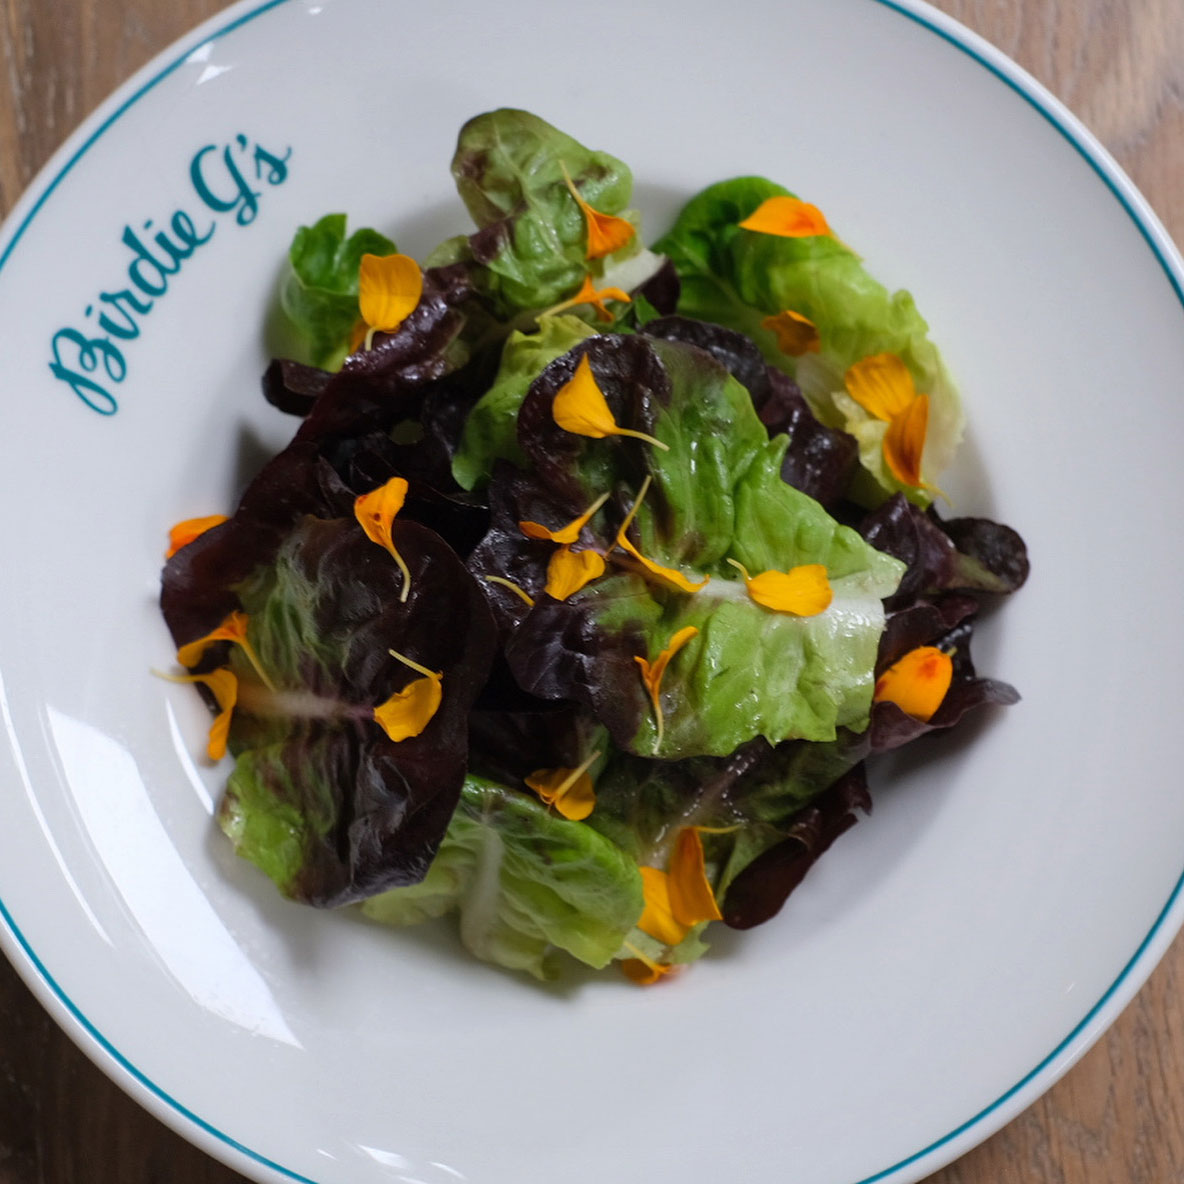 The Healthy Yucky Green Salad